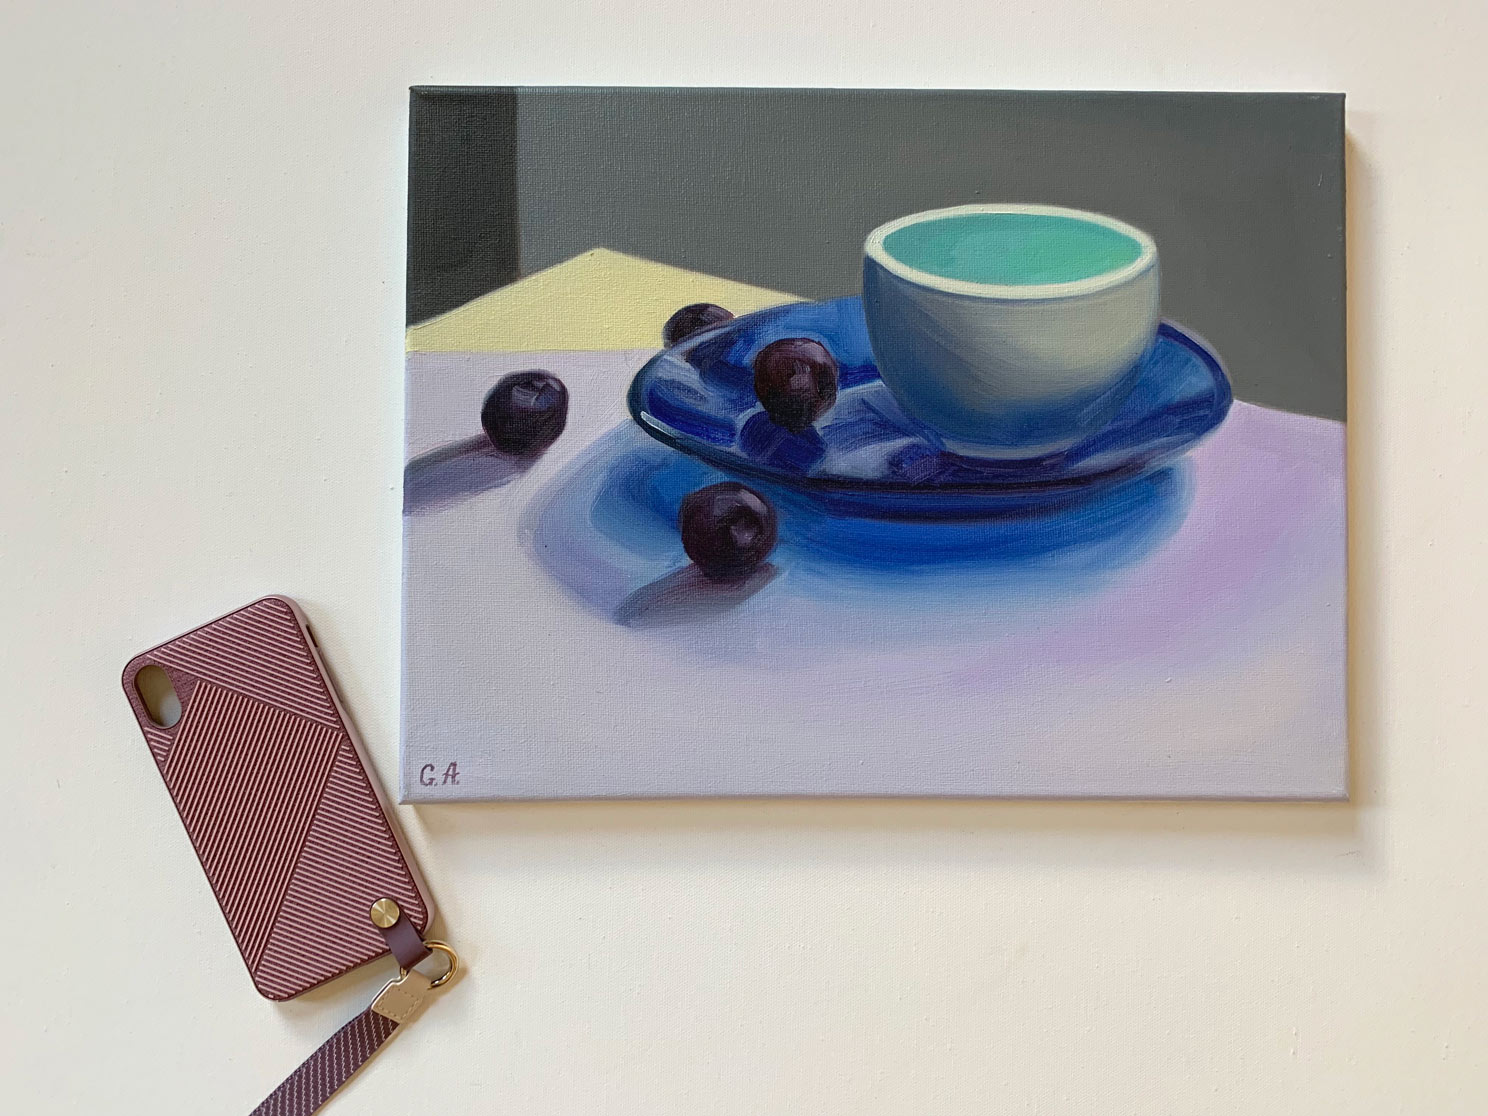 IPhone-XS-Max-Moshi-Altra-Case-Strap-Giselle-Ayupova-Painting-Still-Life-Black-Cherries.jpg